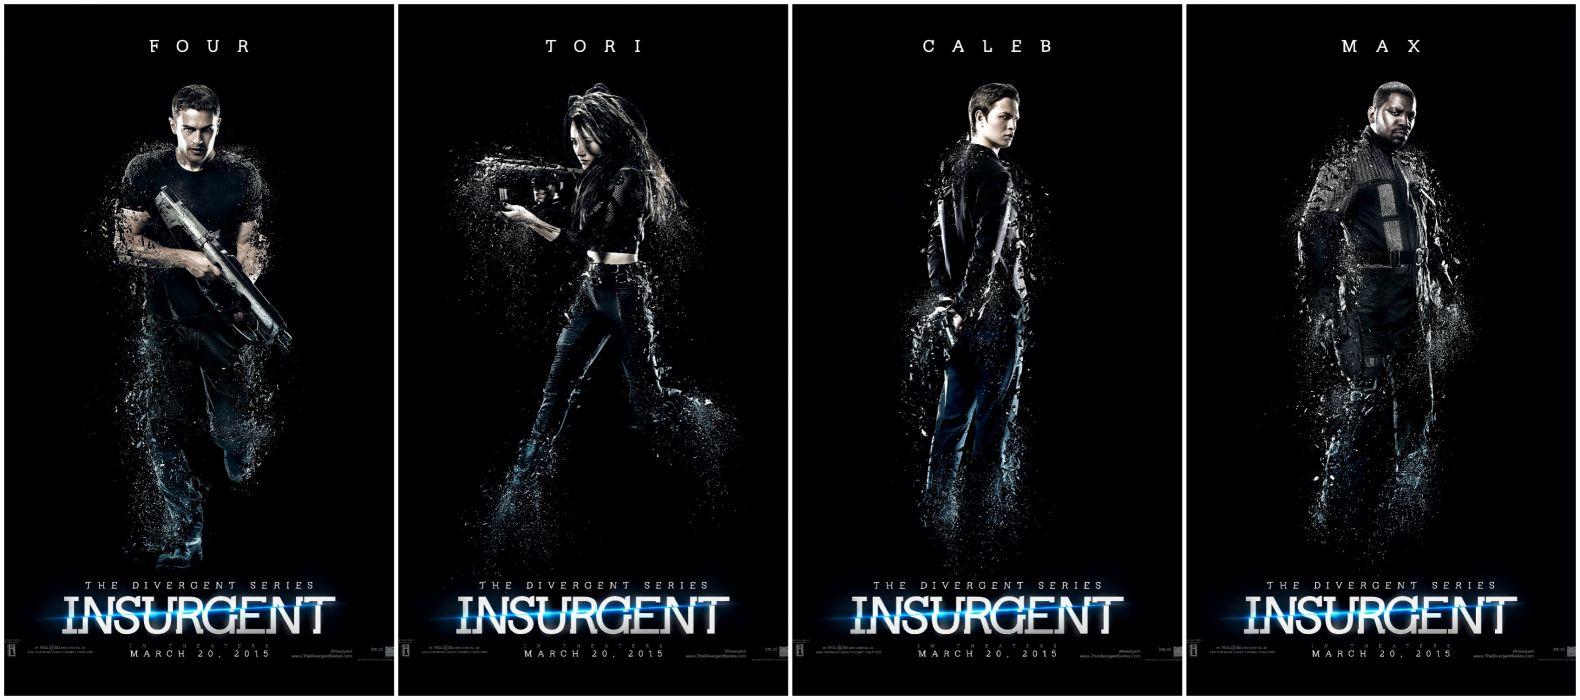 INSURGENT action adventure sci-fi fantasy series 1insurgent divergent weapon gun poster wallpaper